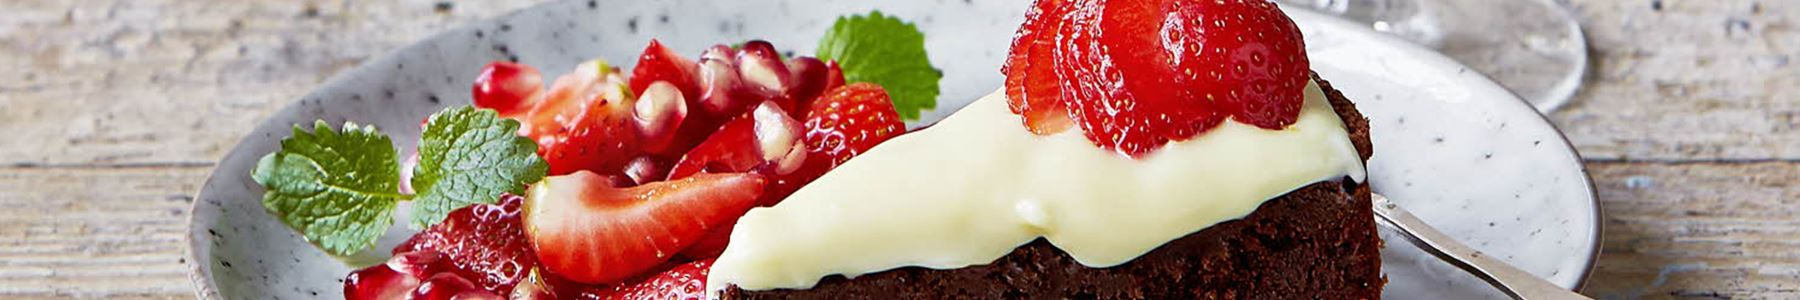 Granatæble + Desserter